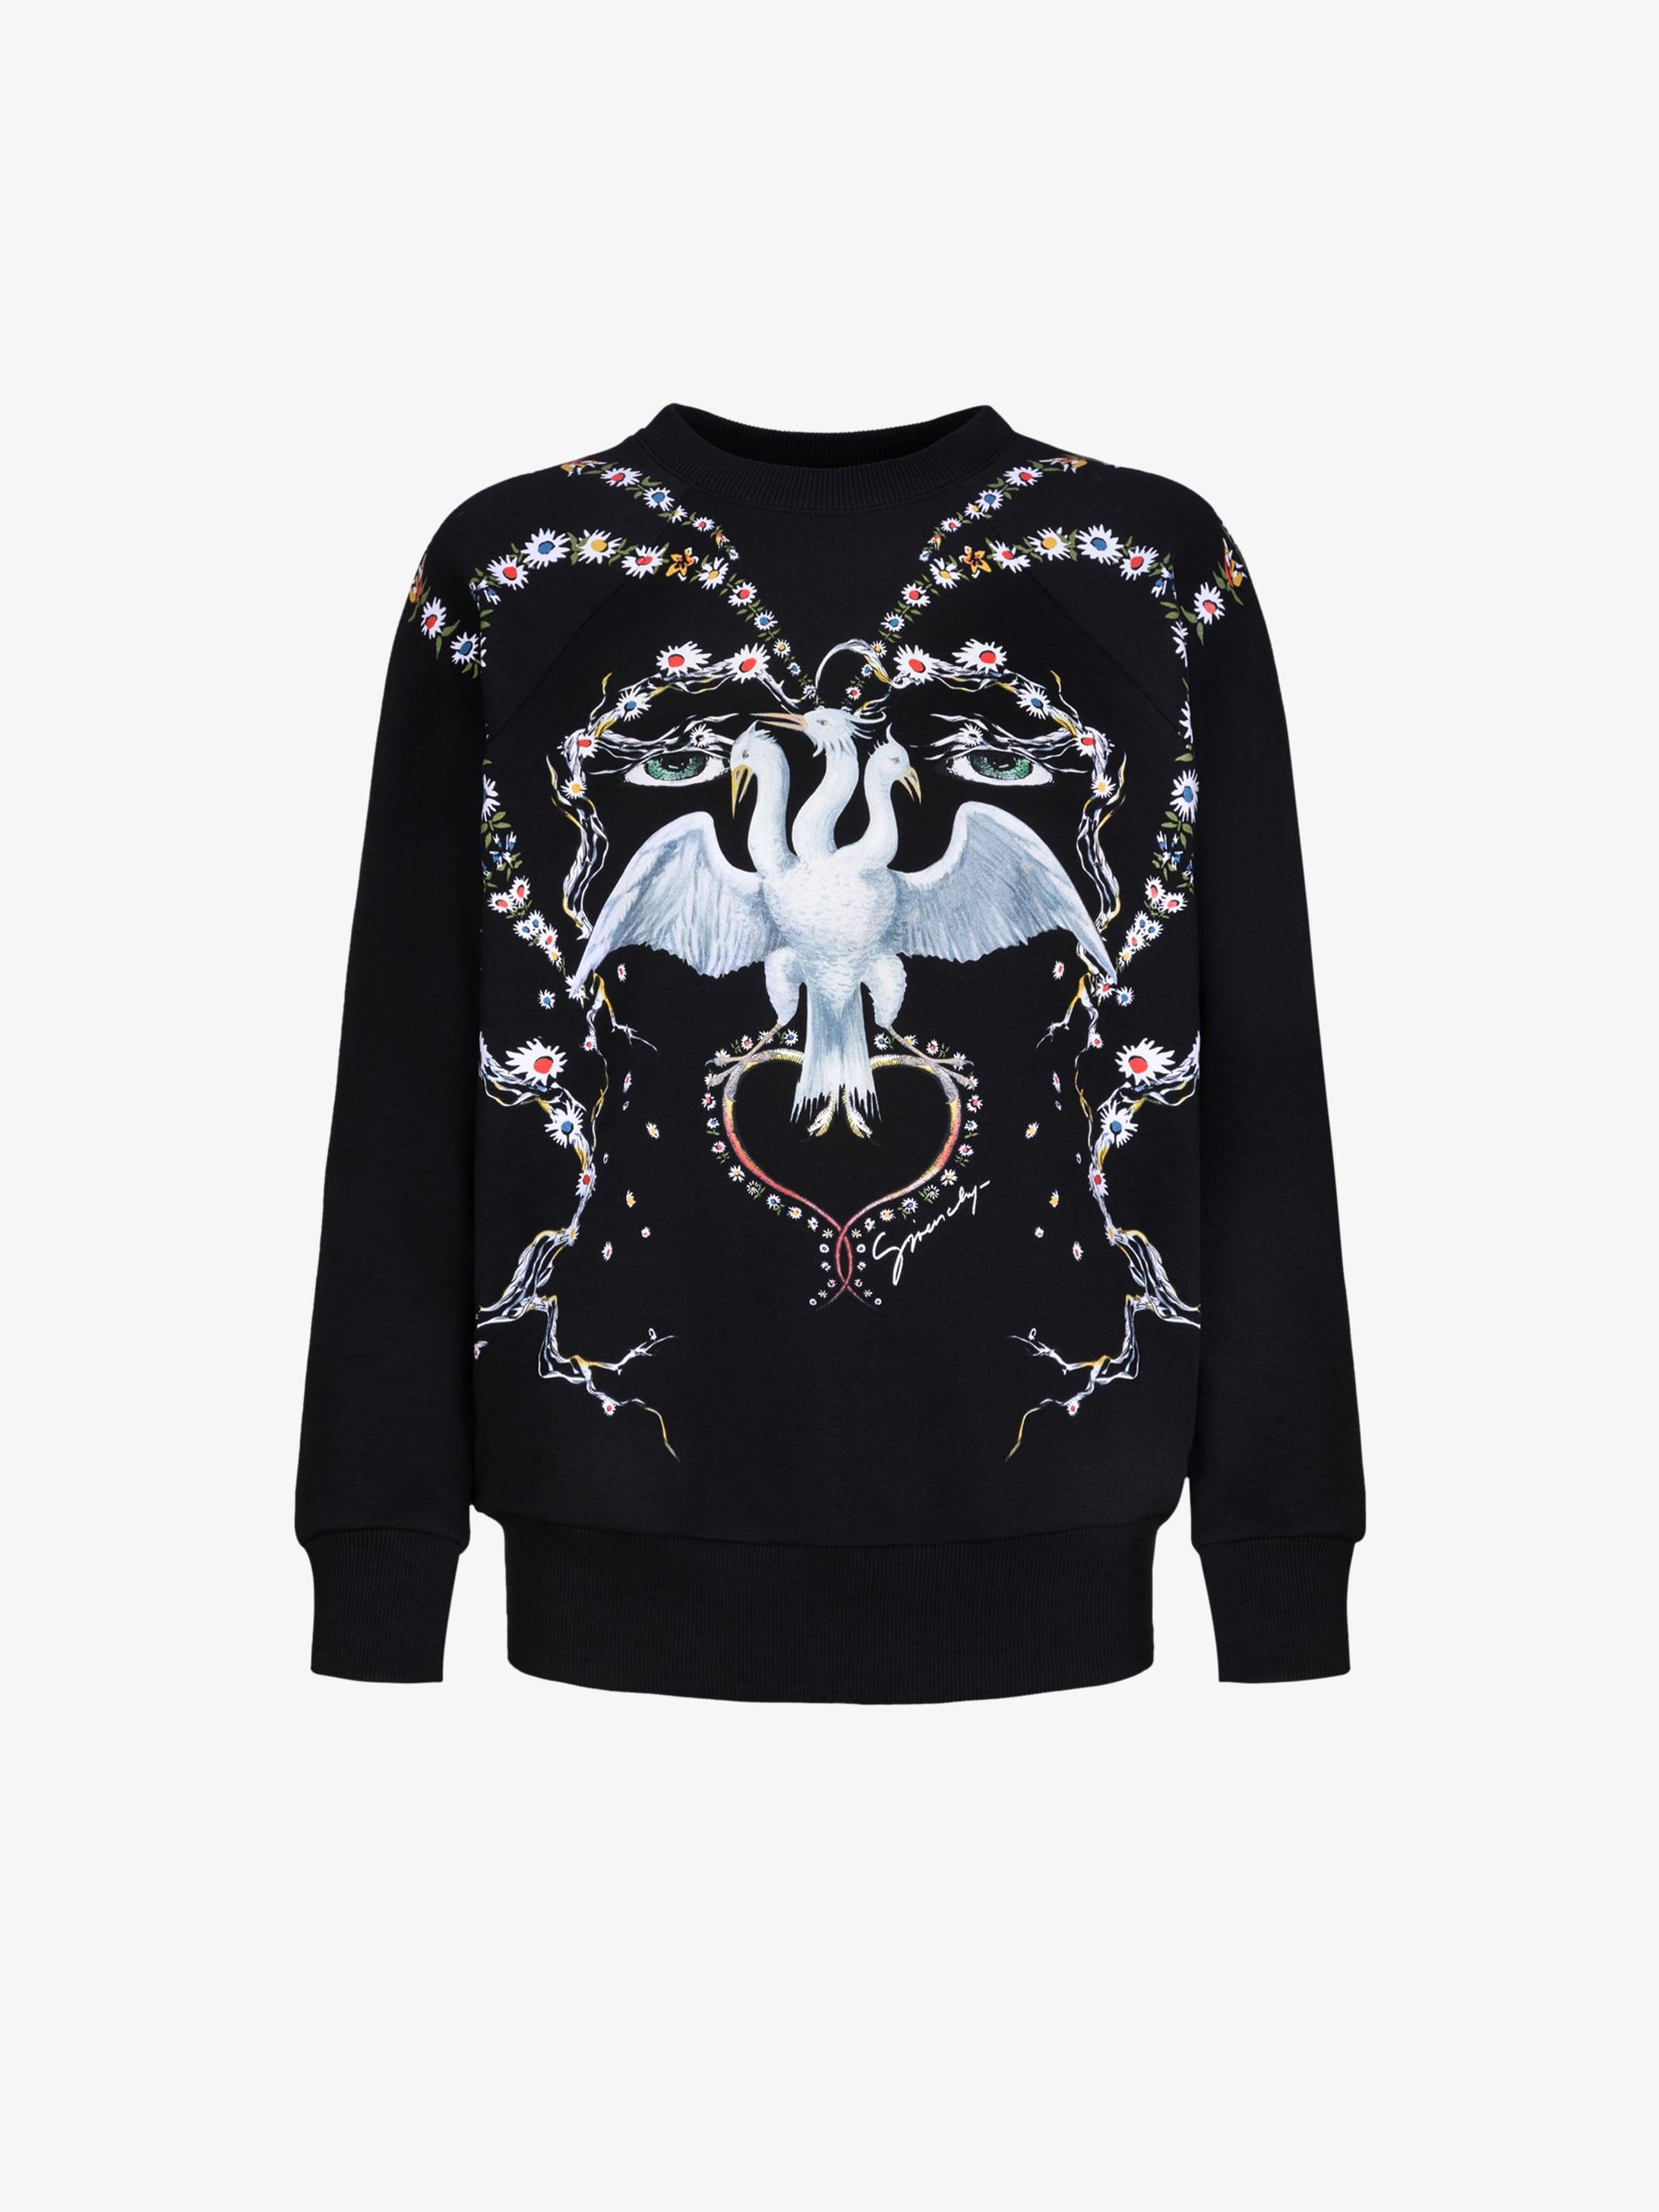 GIVENCHY bird printed sweatshirt